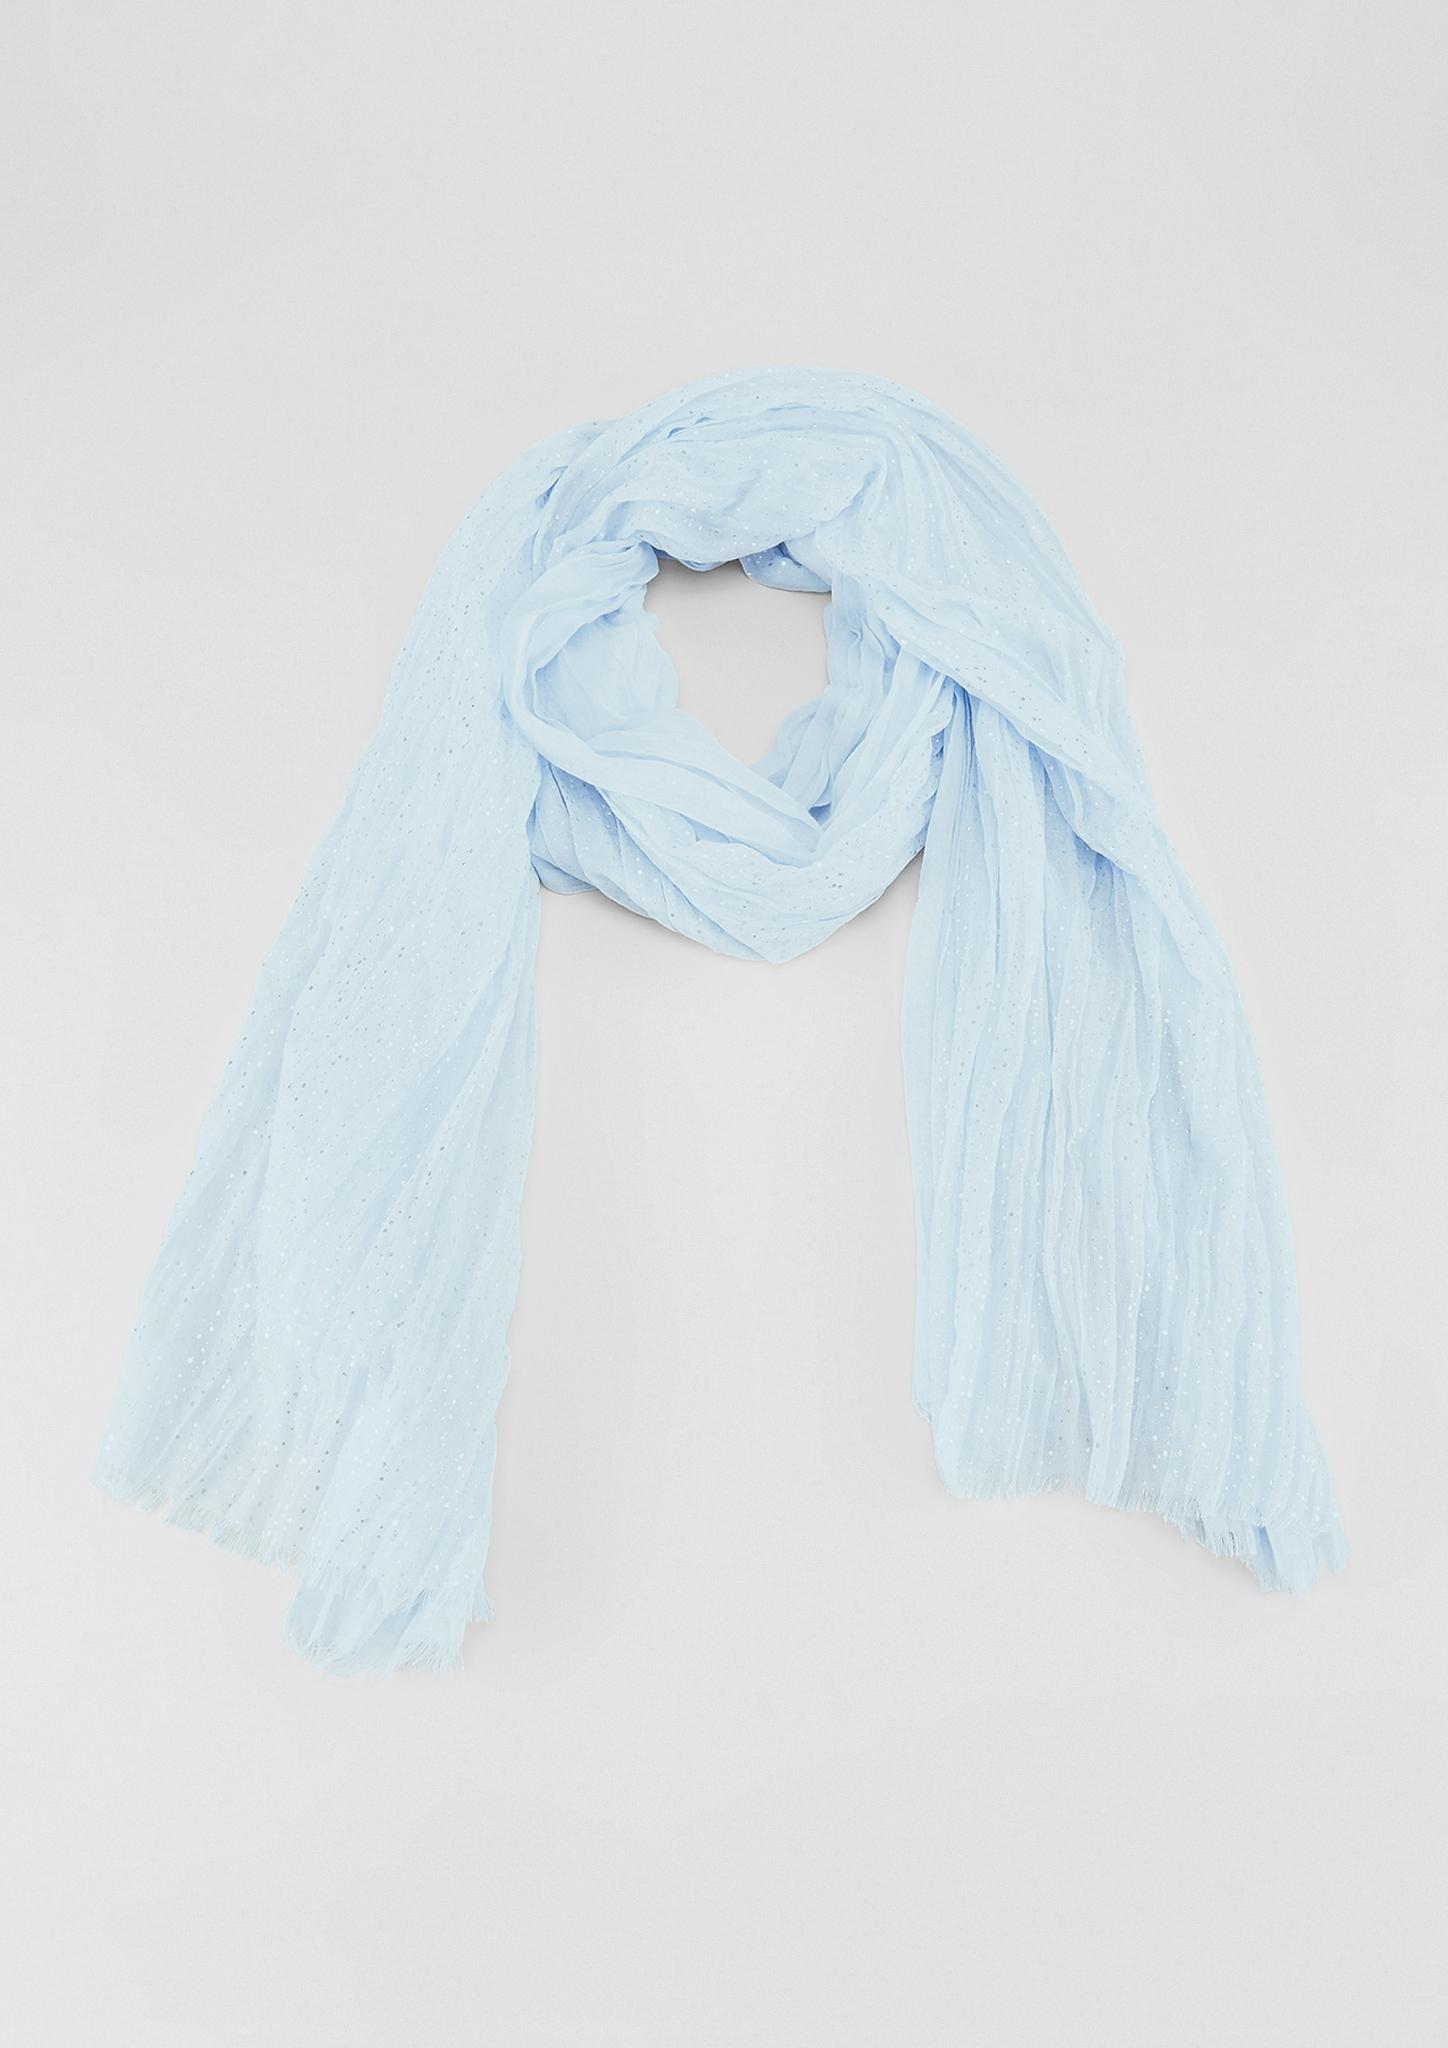 Crinkle-Schal | Accessoires > Schals & Tücher | Blau | 100% polyester | s.Oliver